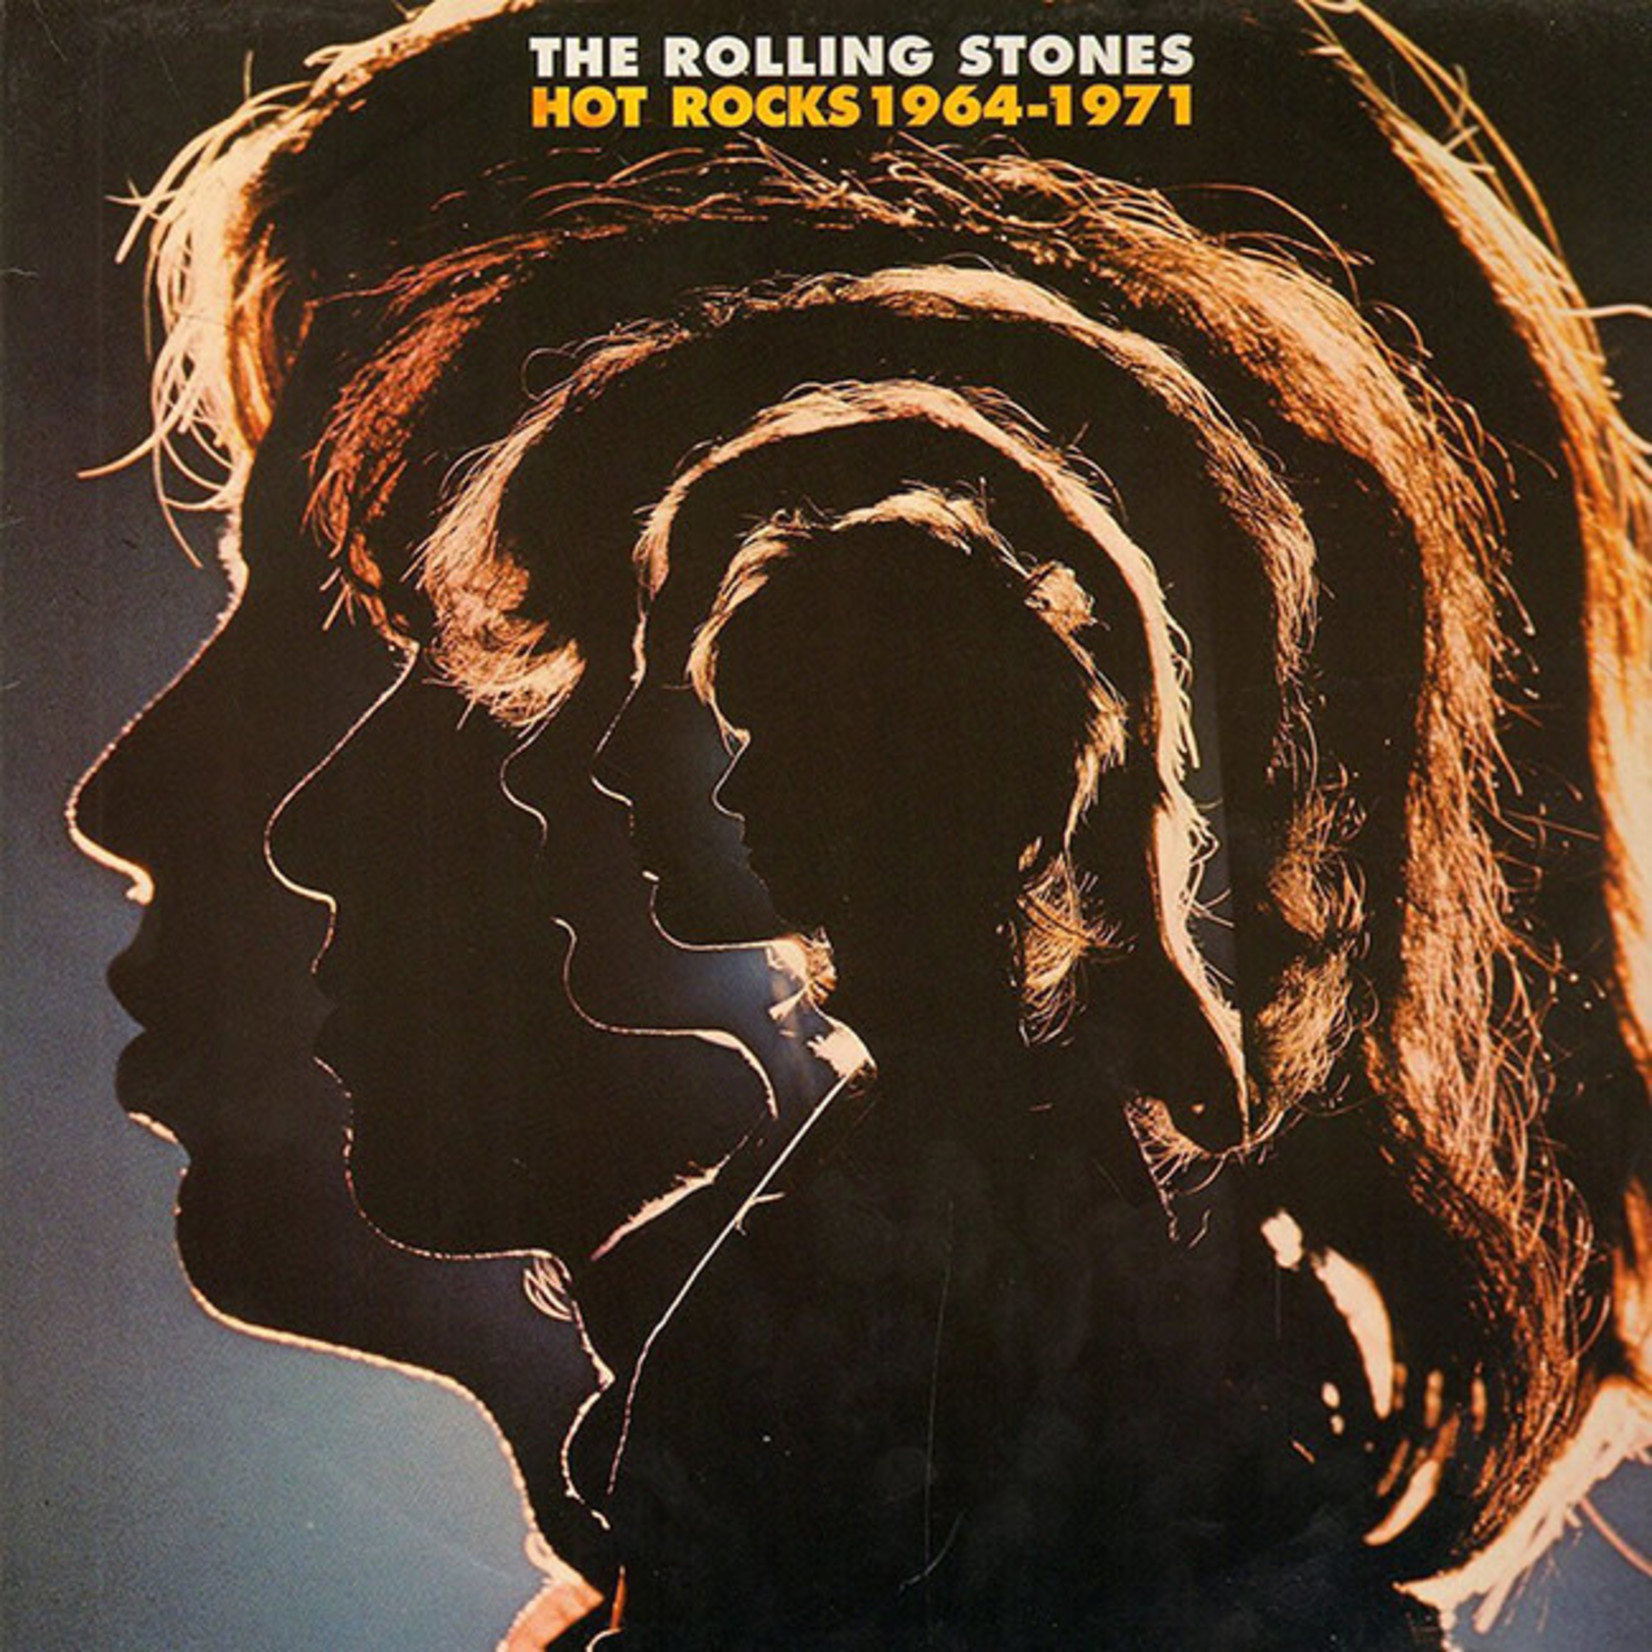 [New] Rolling Stones: Hot Rocks: 1964-1971 (2LP)